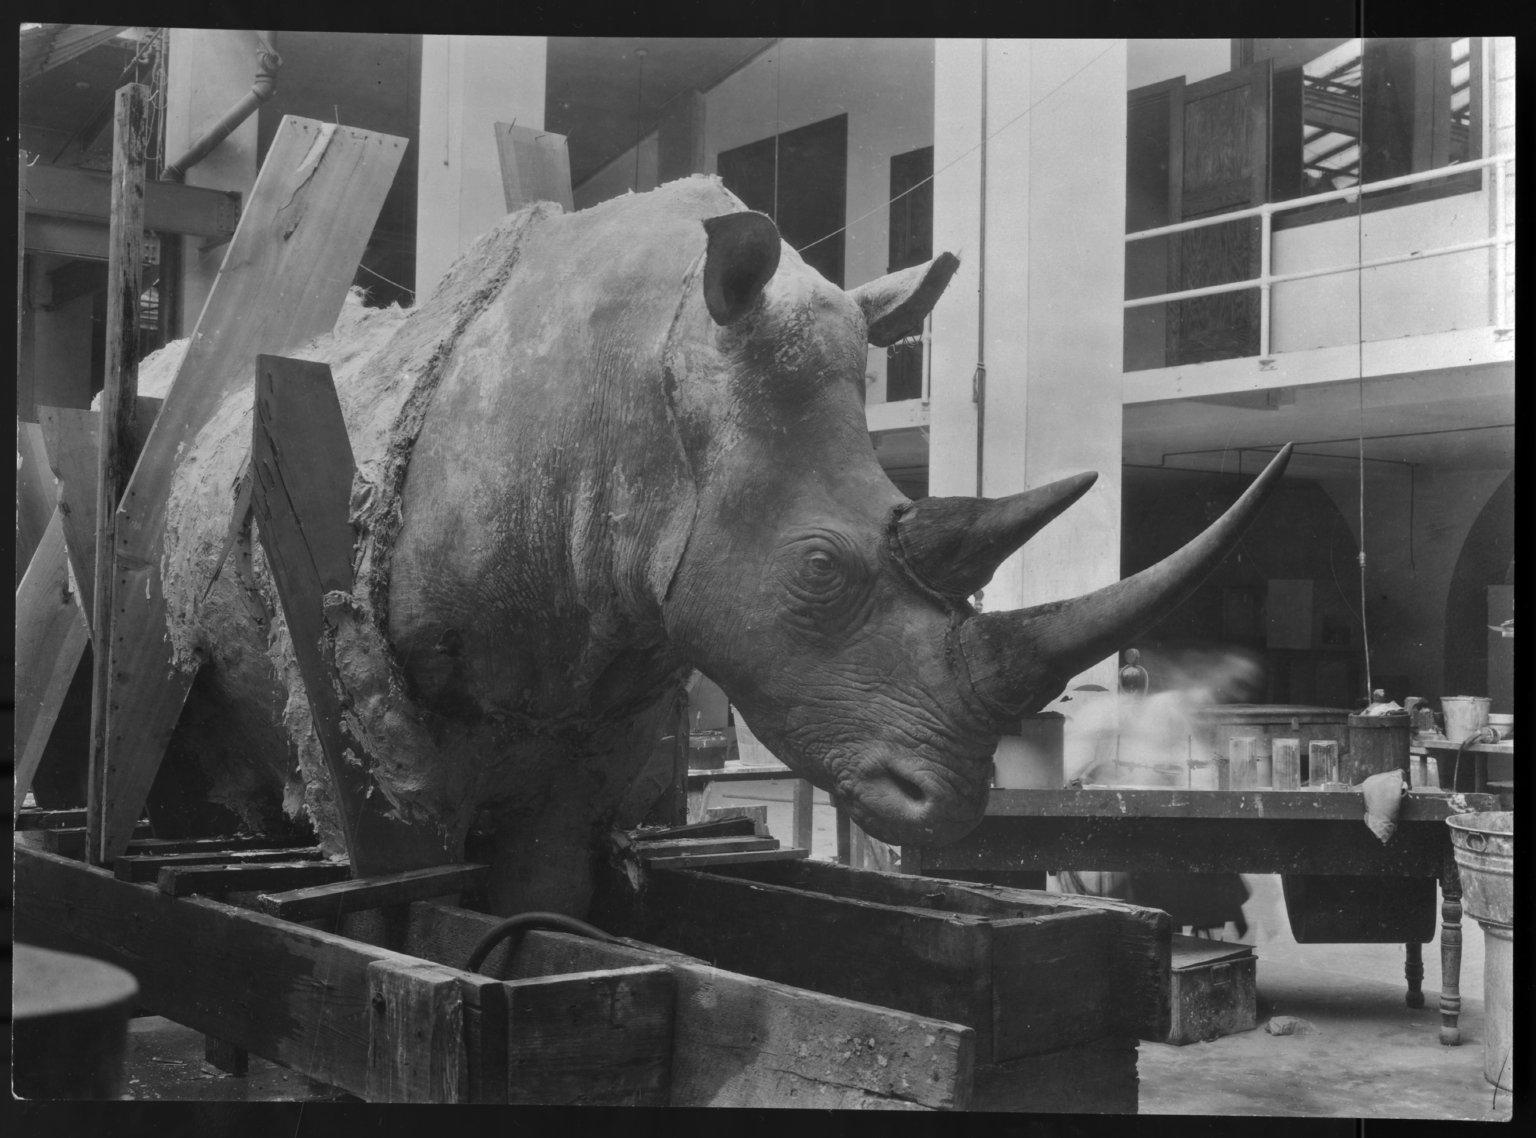 Rhinoceros mount being prepared for exhibit The Field Museum